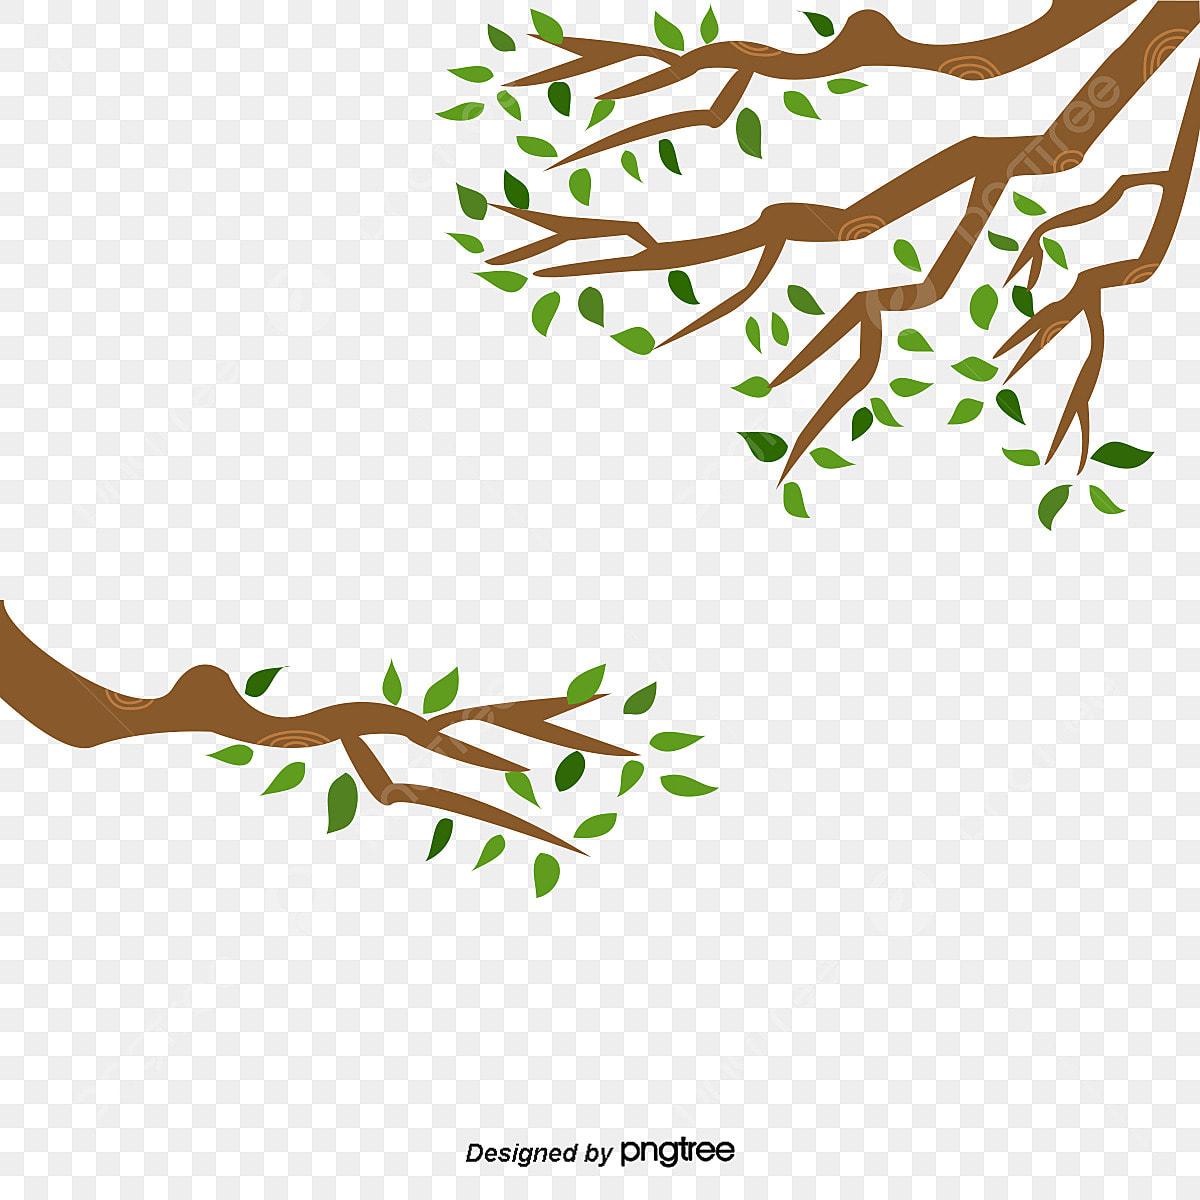 Leaf Twig U624bu6284u5831 Clip Art - Cartoon Tree Branch - Free Transparent  PNG Clipart Images Download